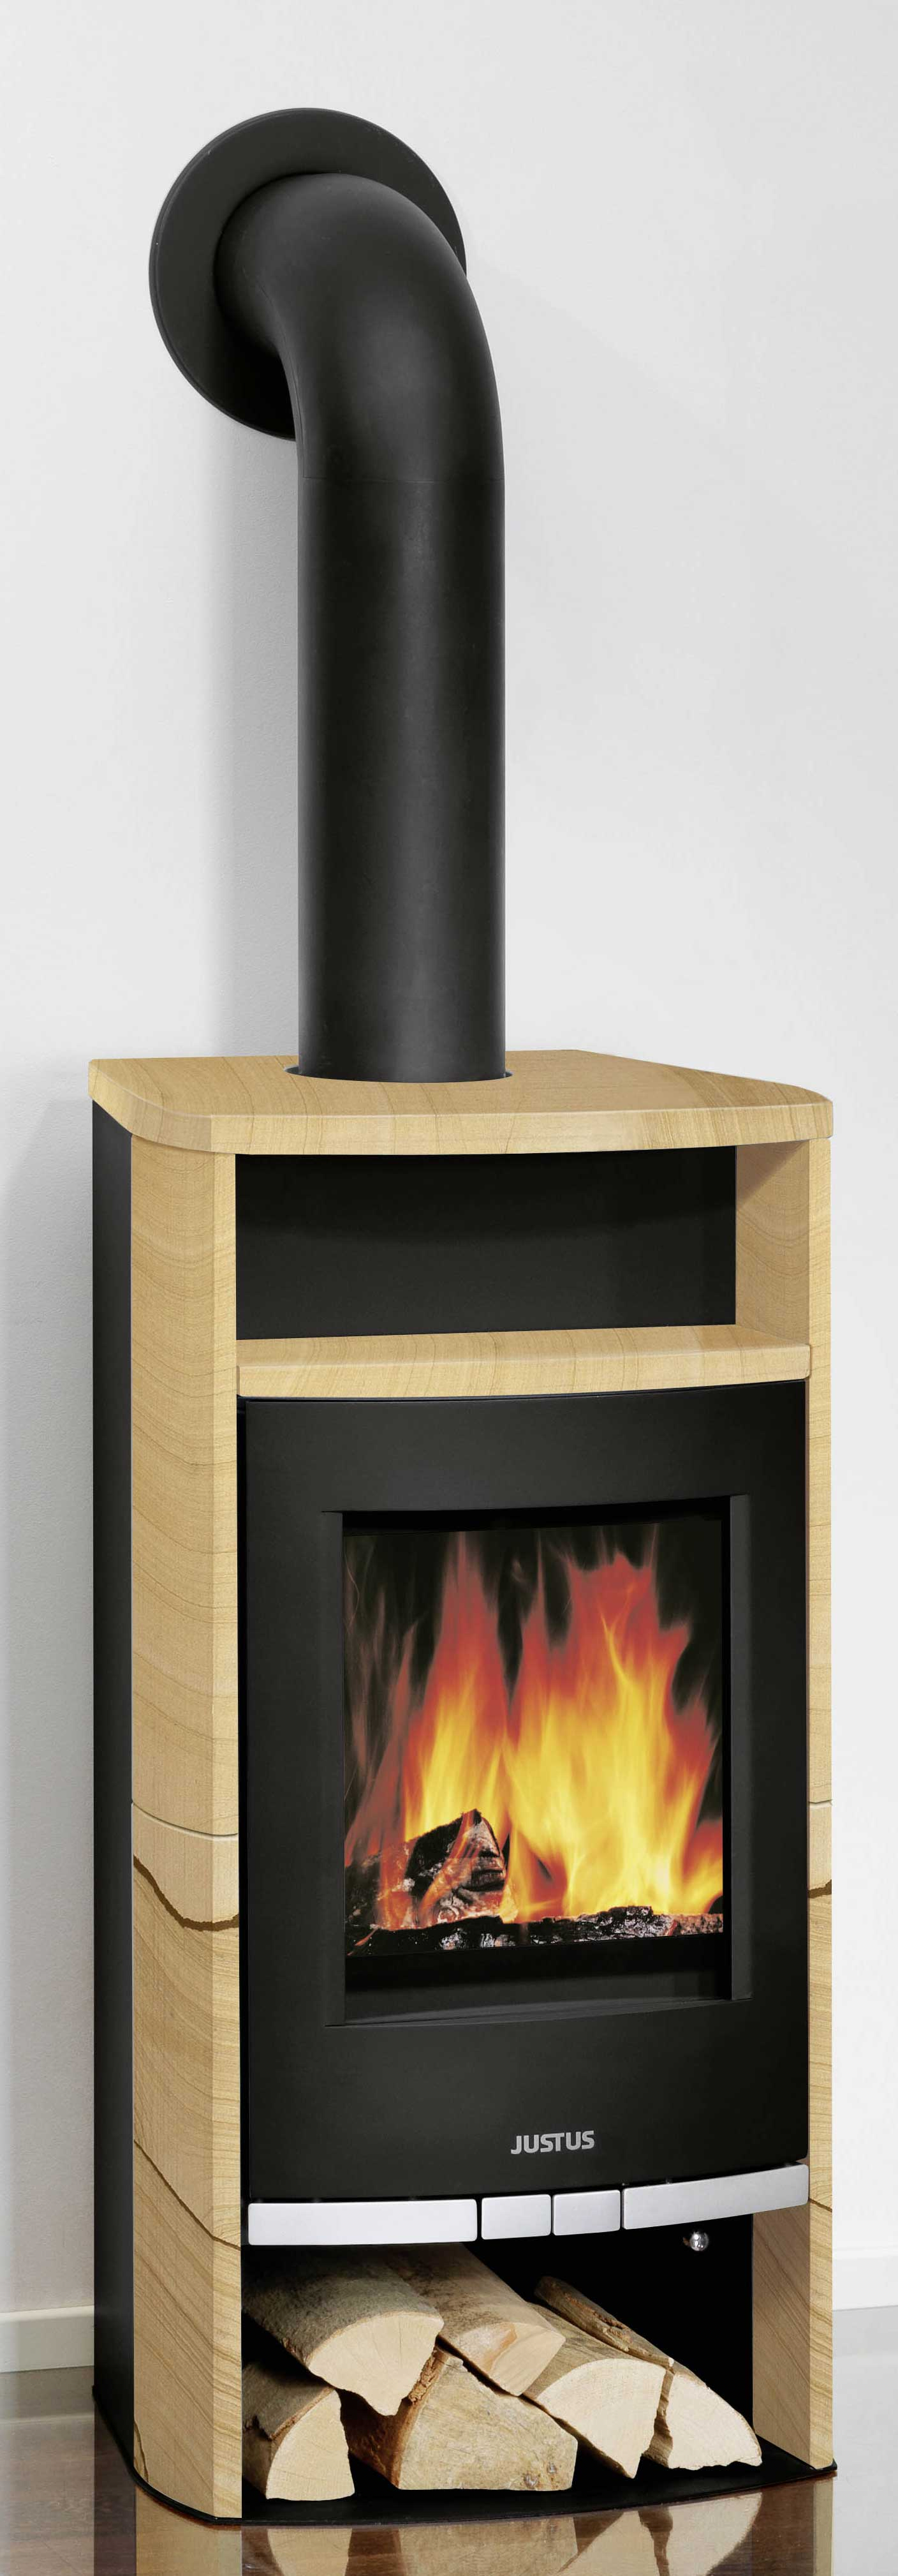 kaminofen frisco raumluftunabh ngig sandstein dauerbrand 5. Black Bedroom Furniture Sets. Home Design Ideas